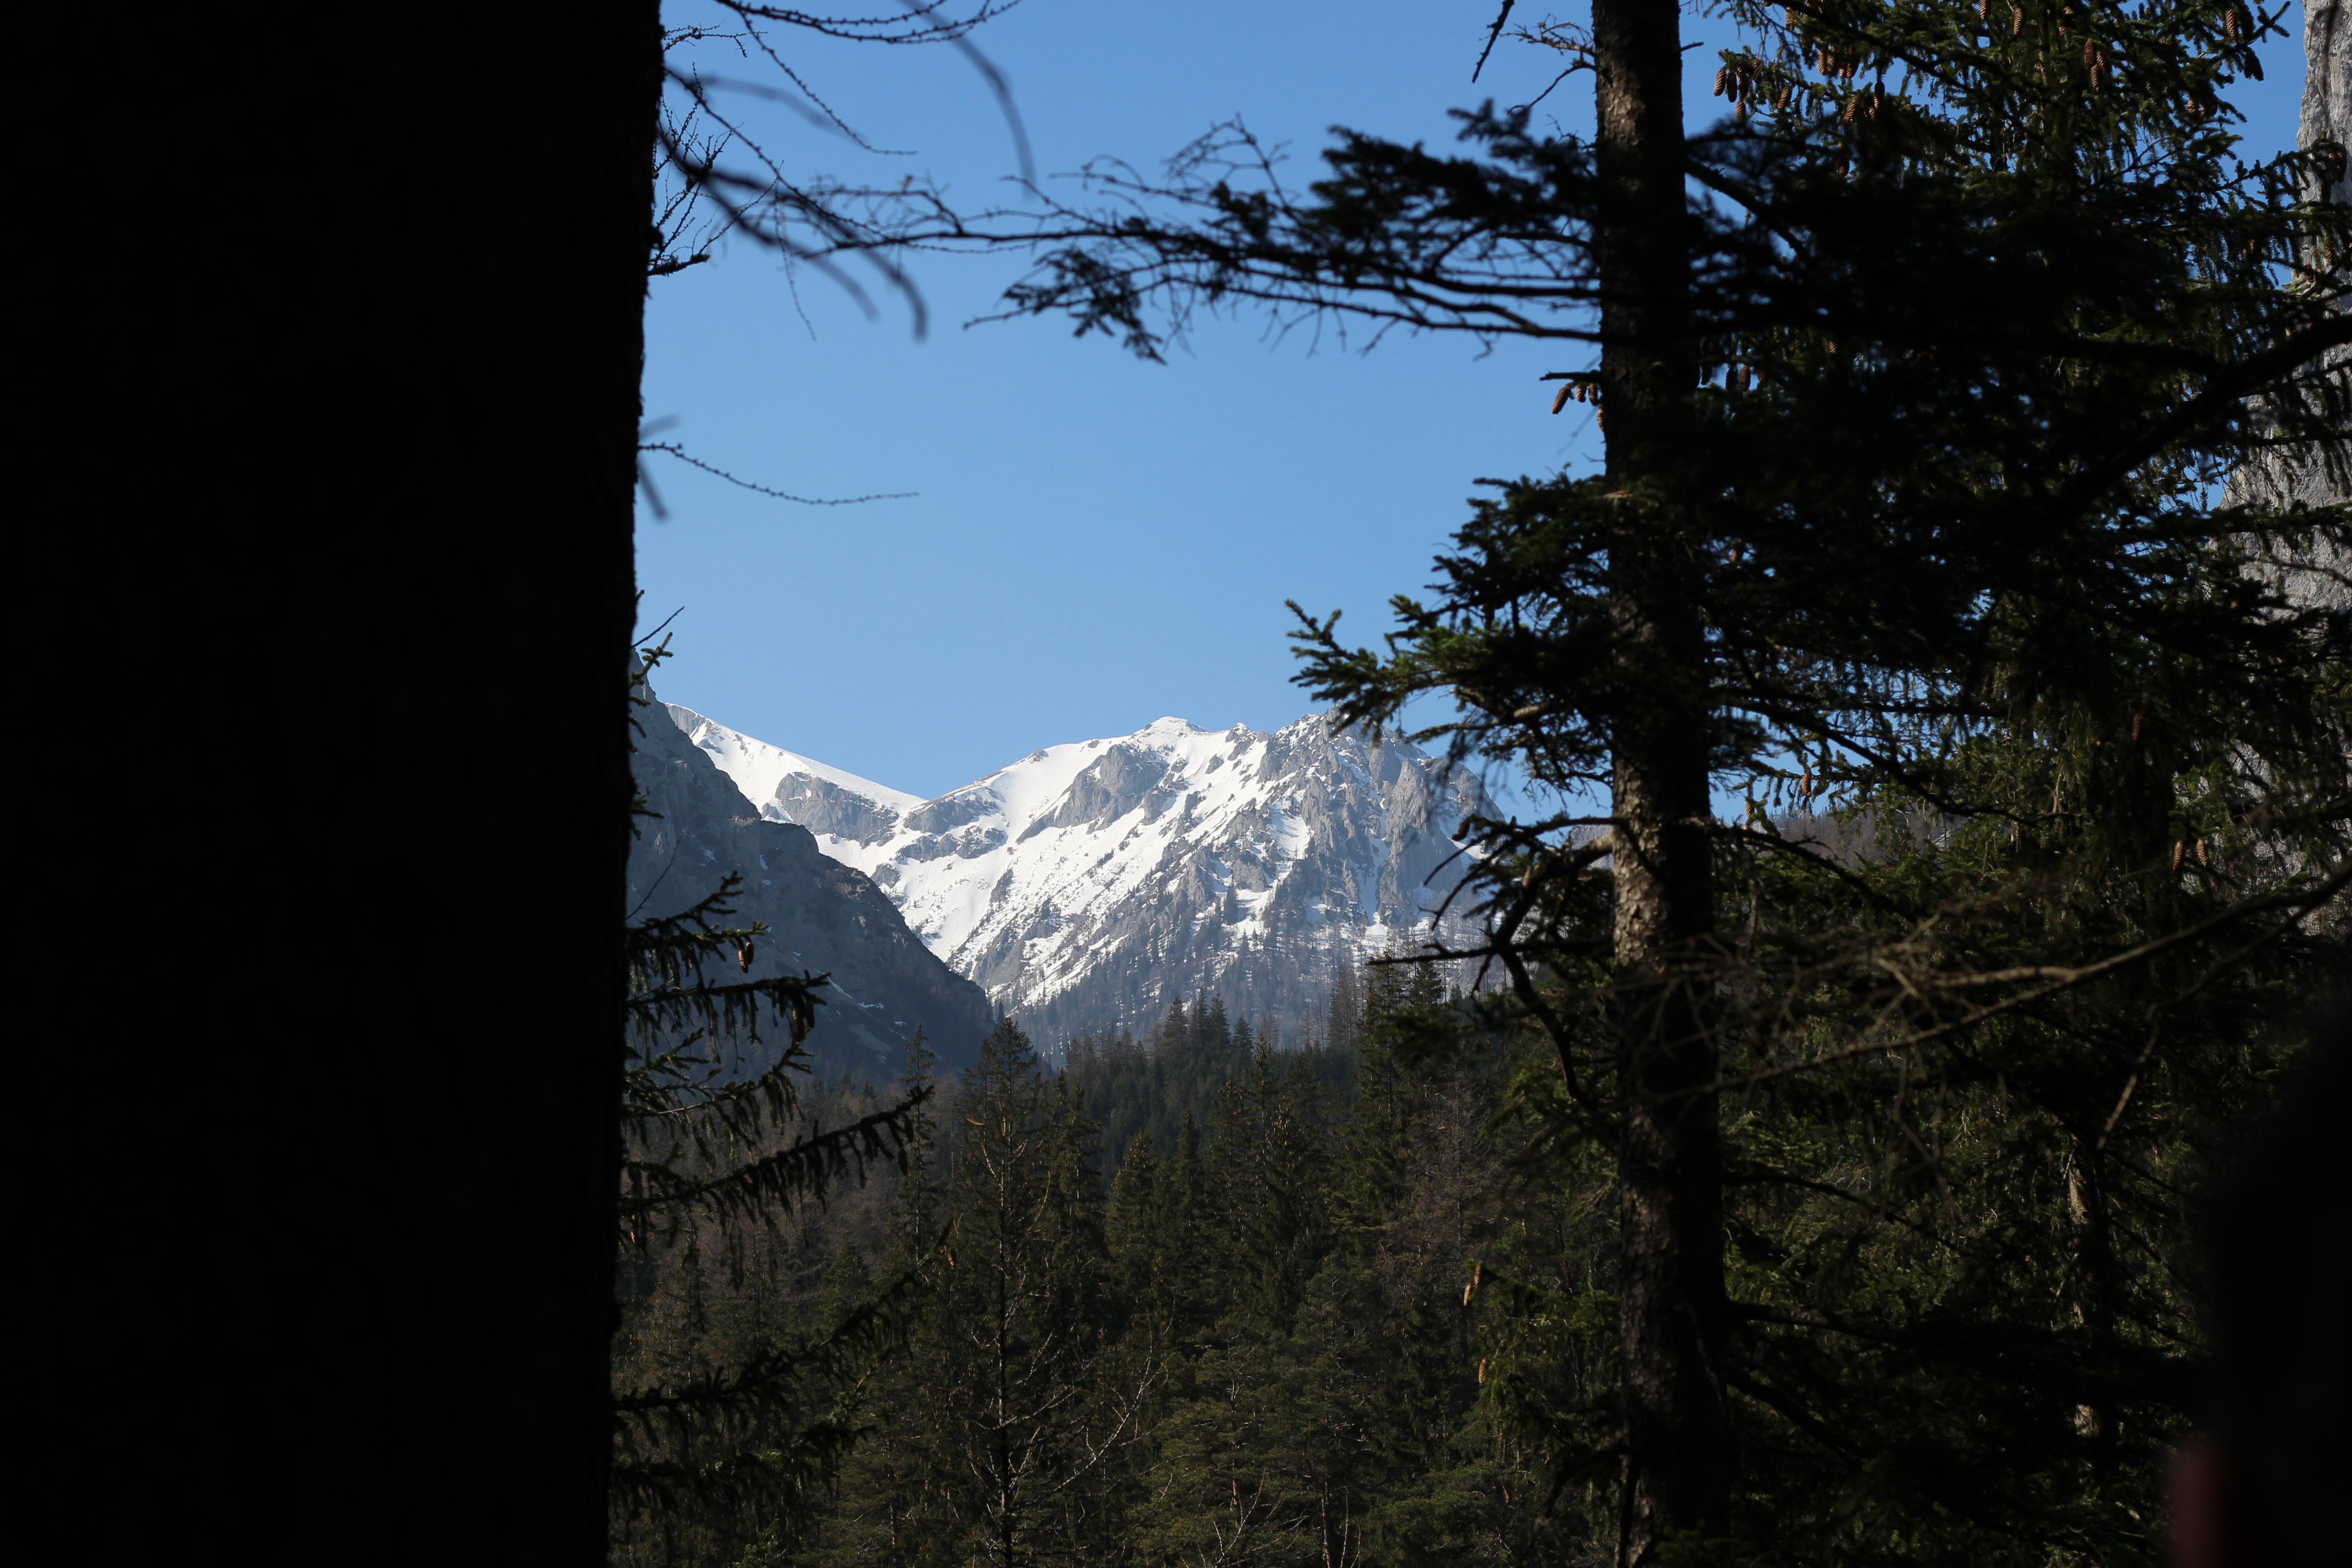 Grüner See Hochschwab Gipfel